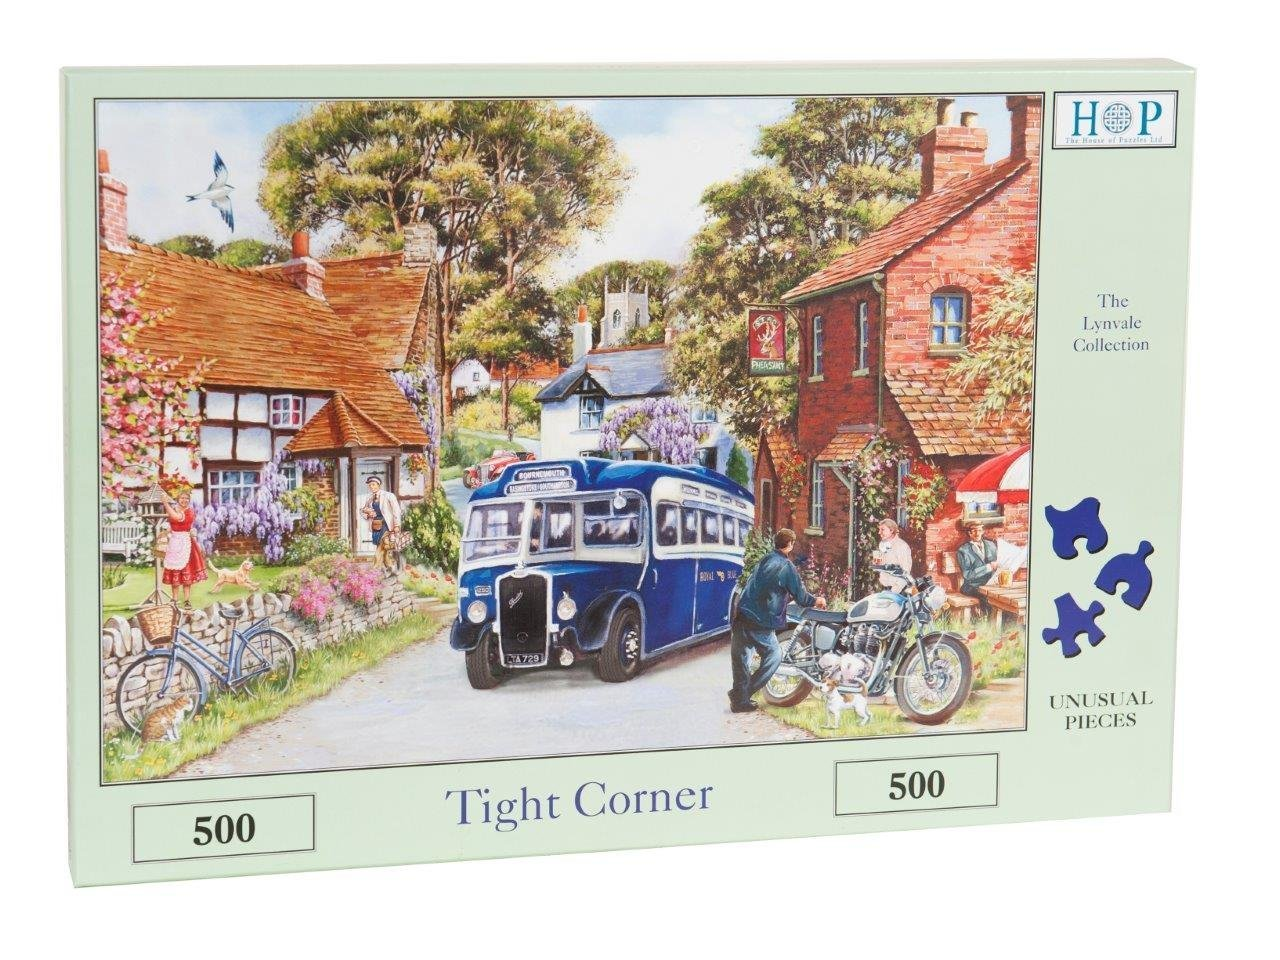 tight-corner-500-pc-jigsaw-puzzle